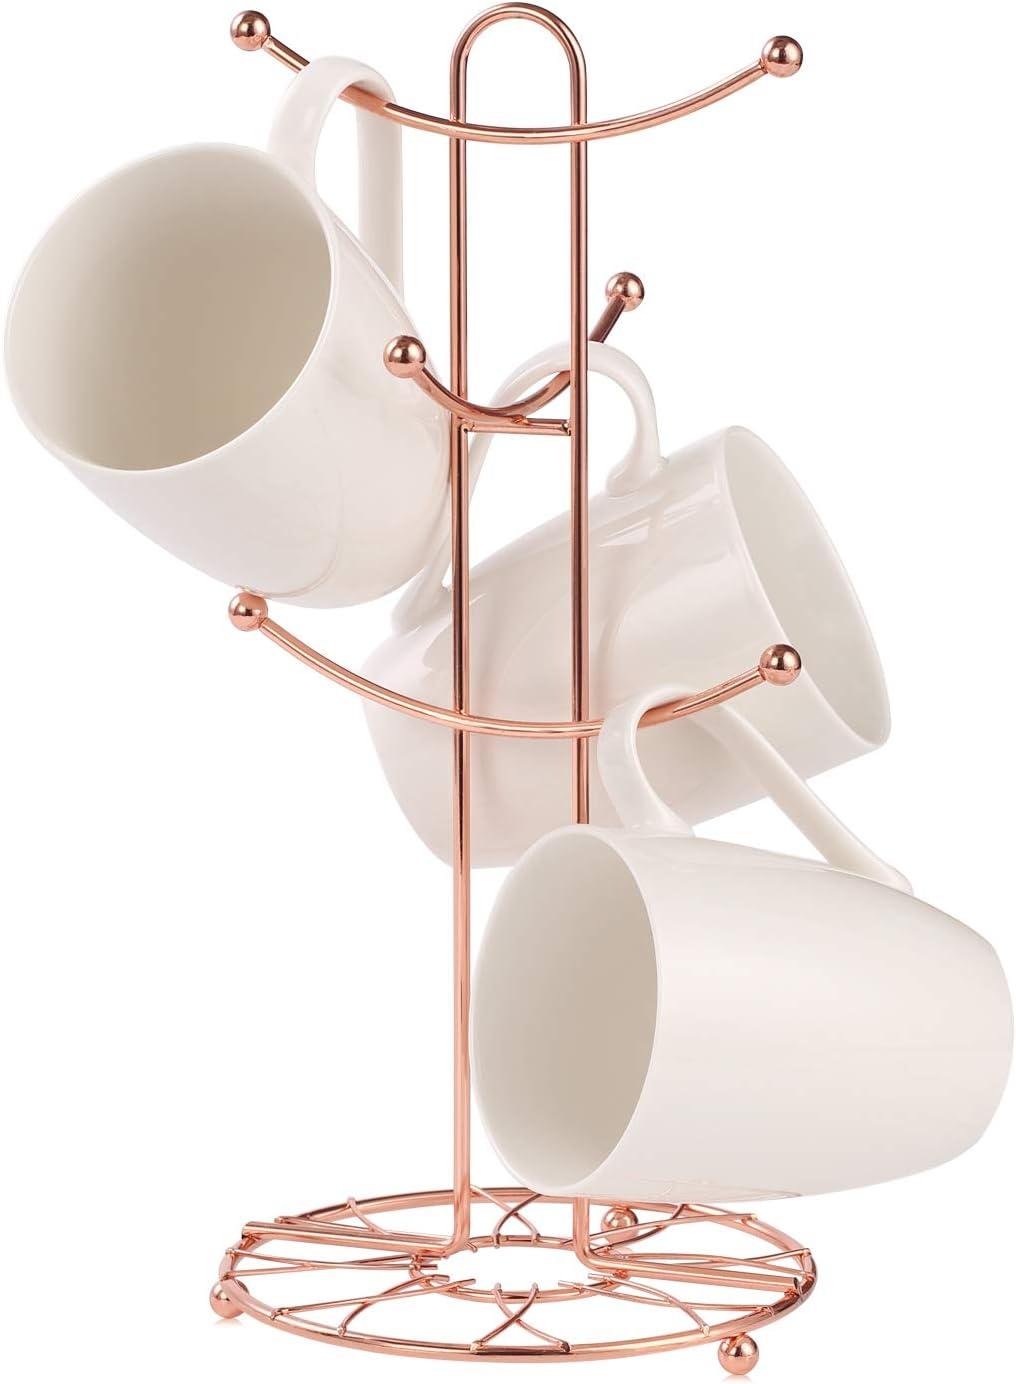 Buruis Mug Rack Tree, Decorative Flower Pattern Base Metal Mug Holder, Kitchen Coffee Mug Tree Countertop Tea Cups Holder Stand, Coffee Cup Dryer with 6 Hooks (Copper)